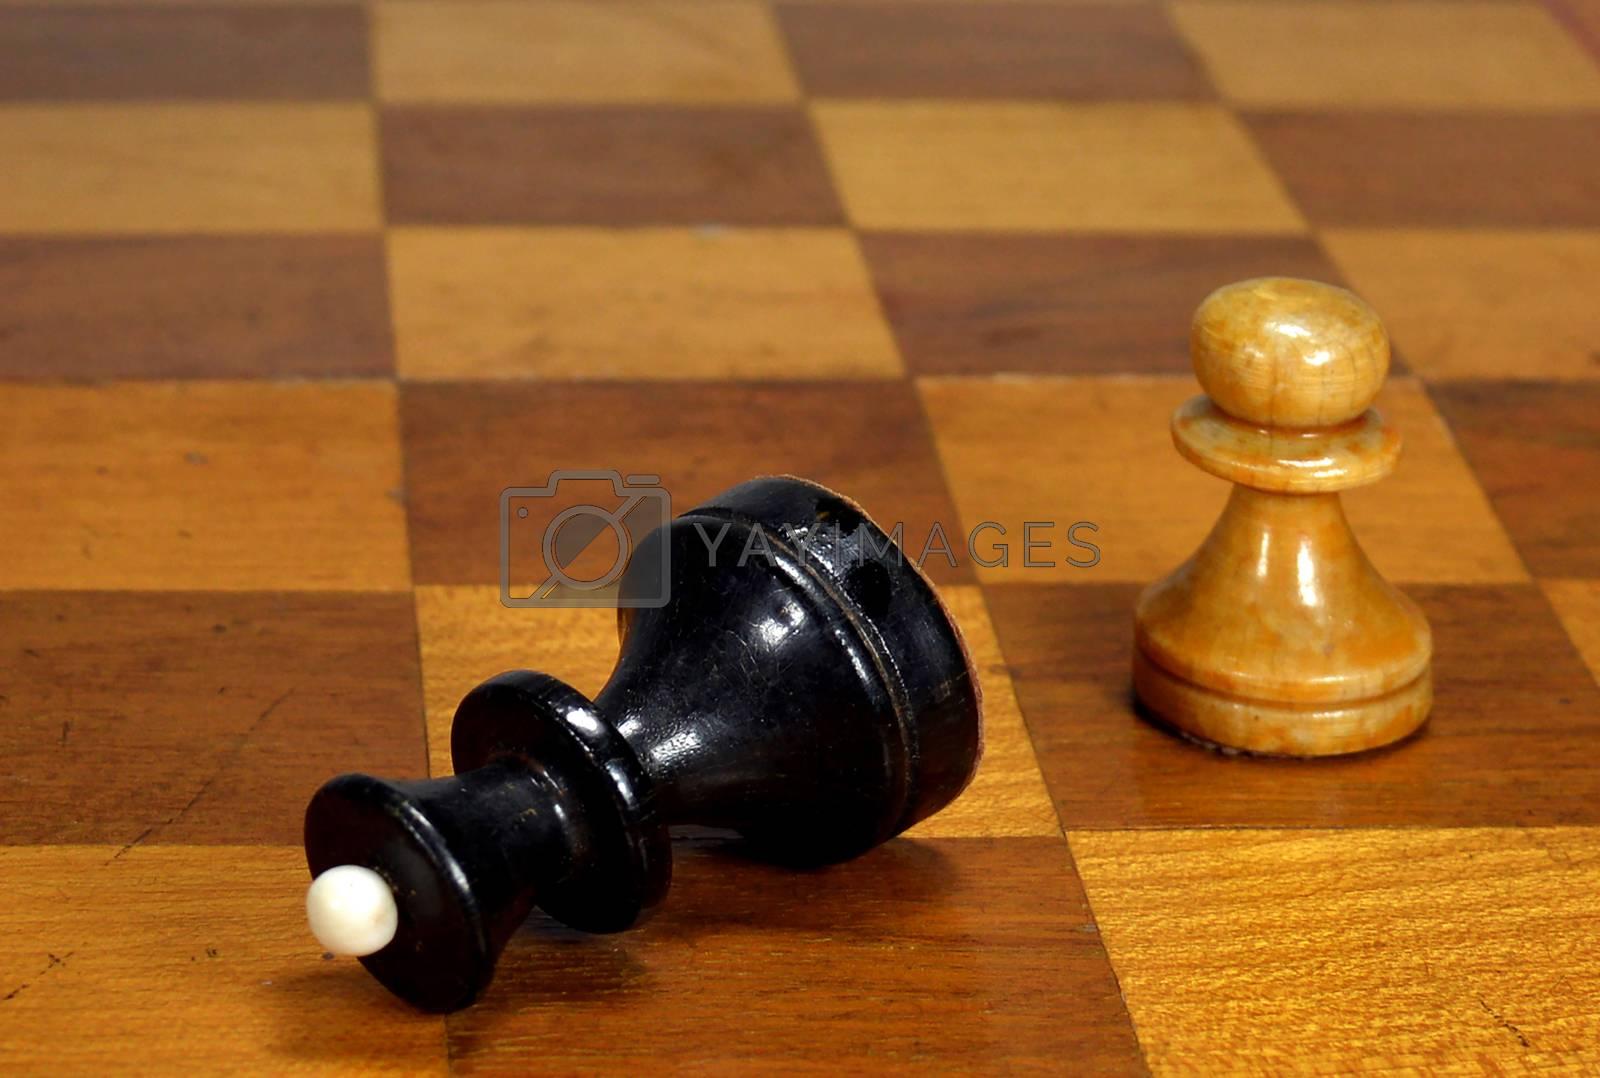 Checkmate pawn queen - conceptual idea